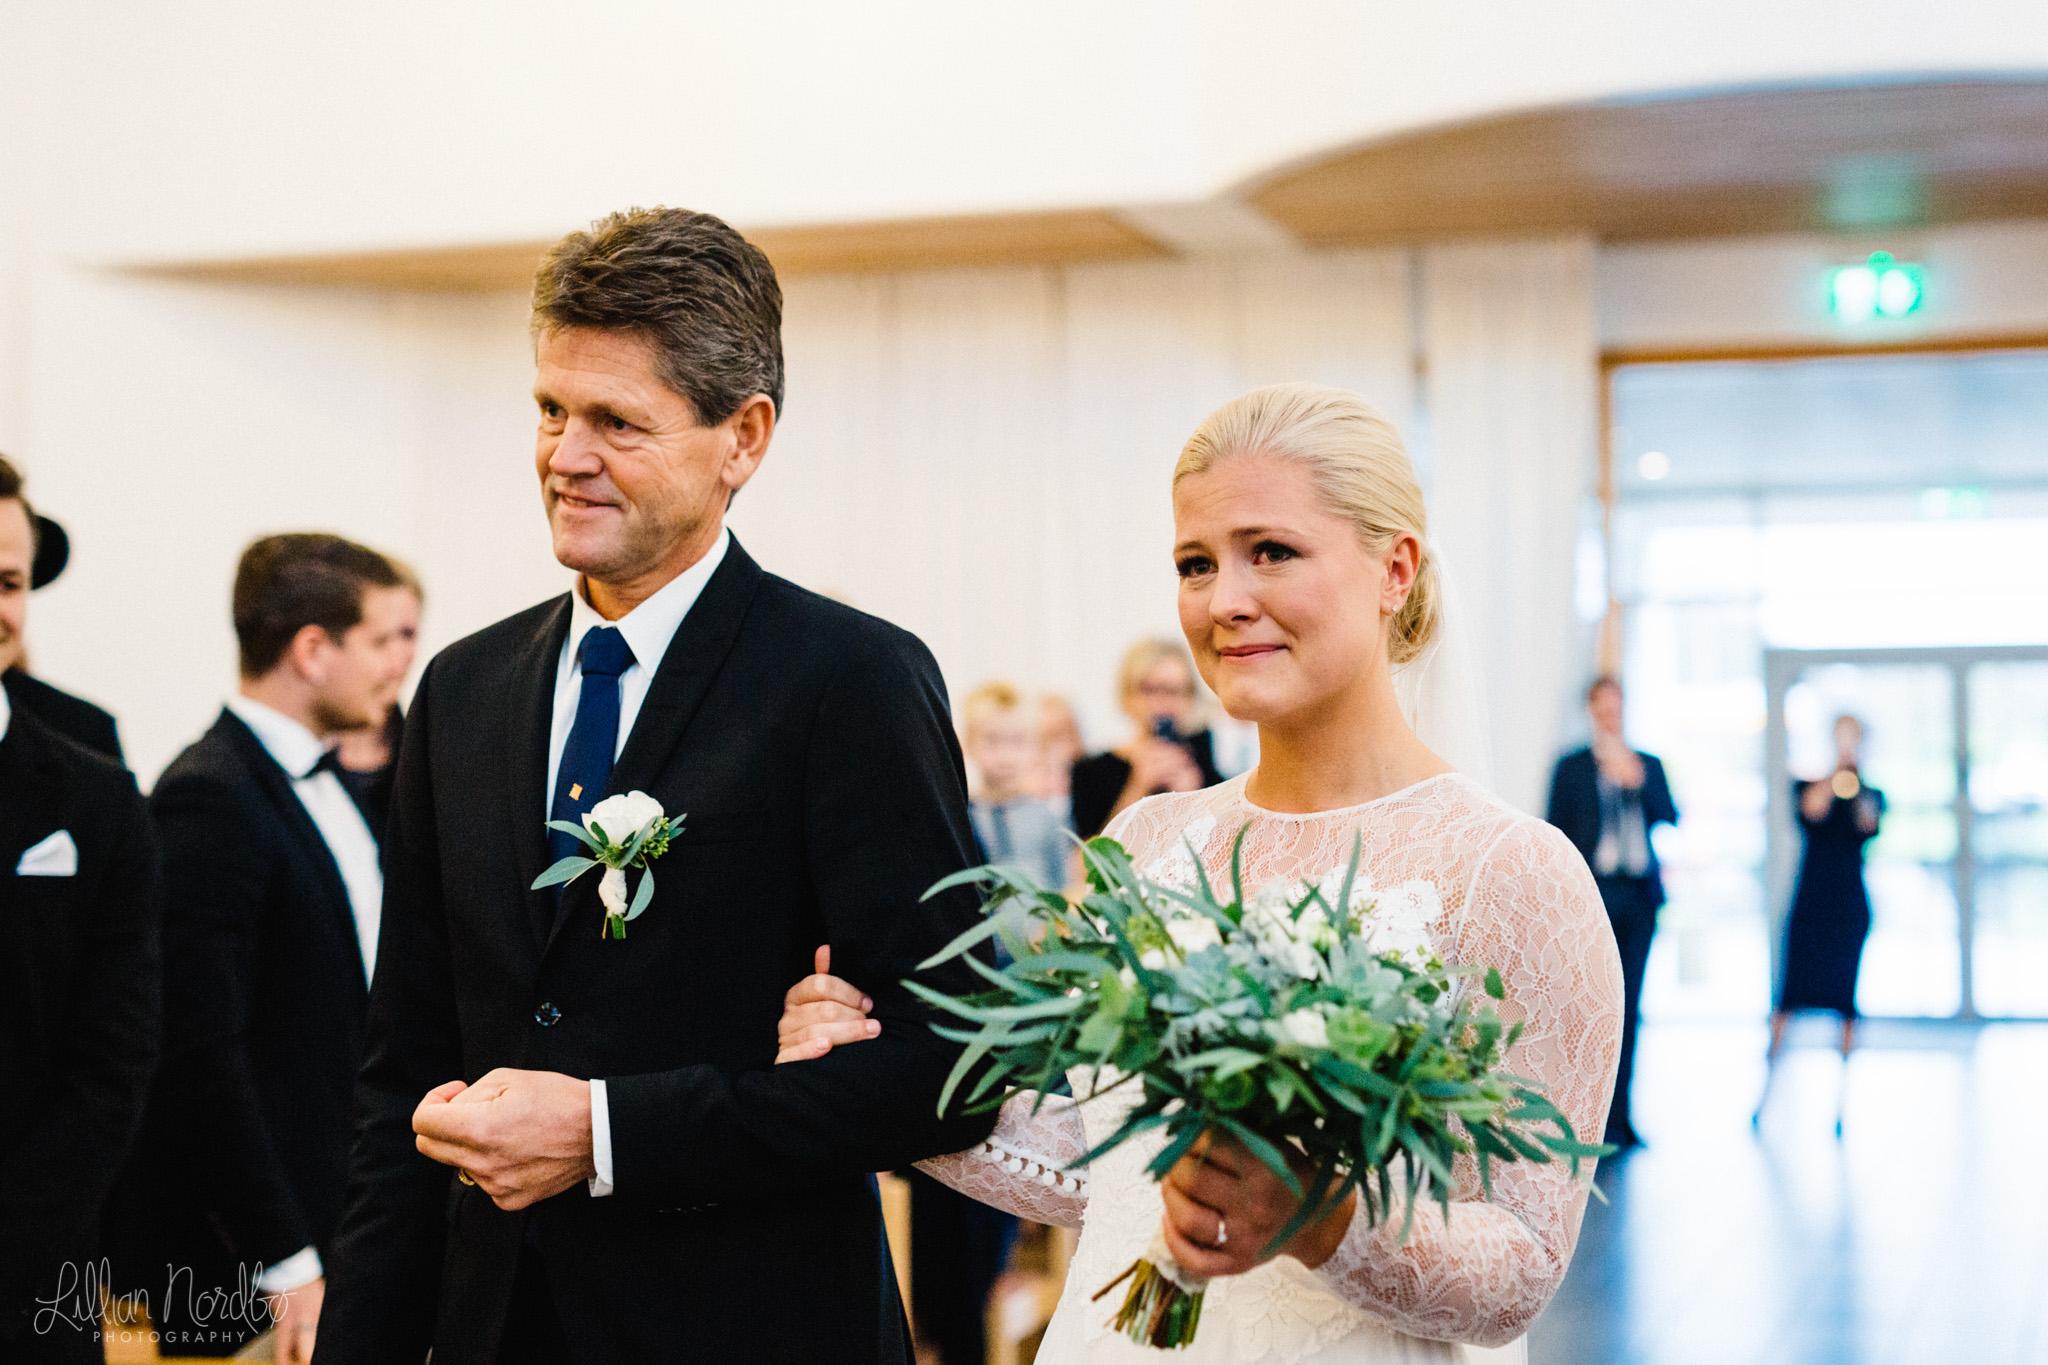 Fotograf Lillian Nordbø - favoritter-8.jpg